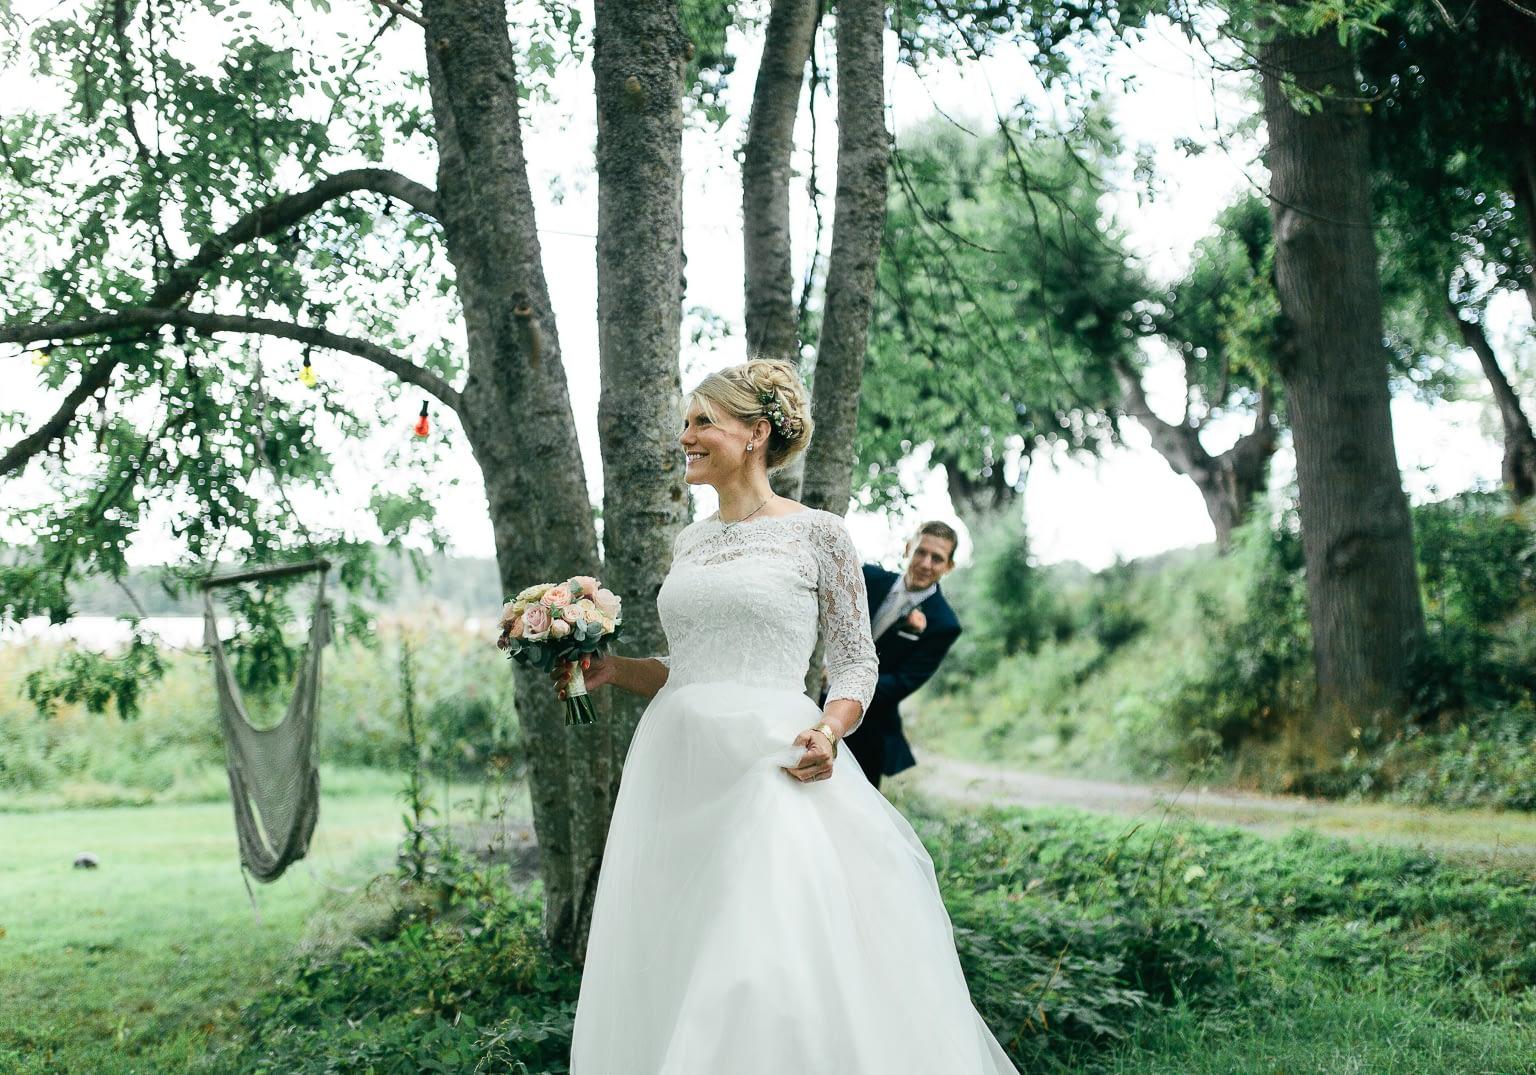 photographie drôle seance photo mariage